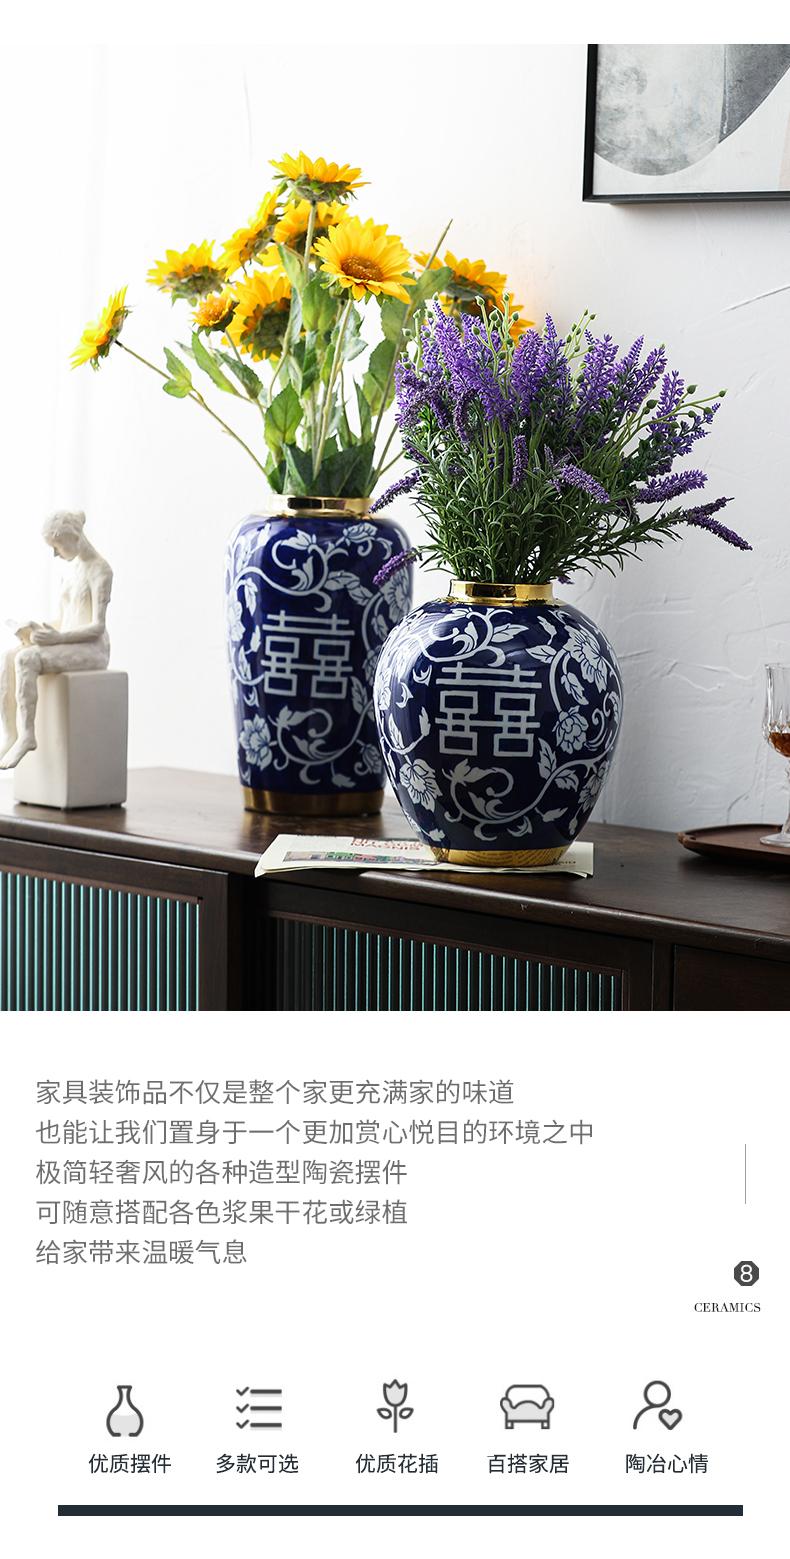 Blue happy character of Blue and white porcelain vase ceramic vases, home furnishing articles furnishing articles Chinese Blue and white porcelain ceramic vase